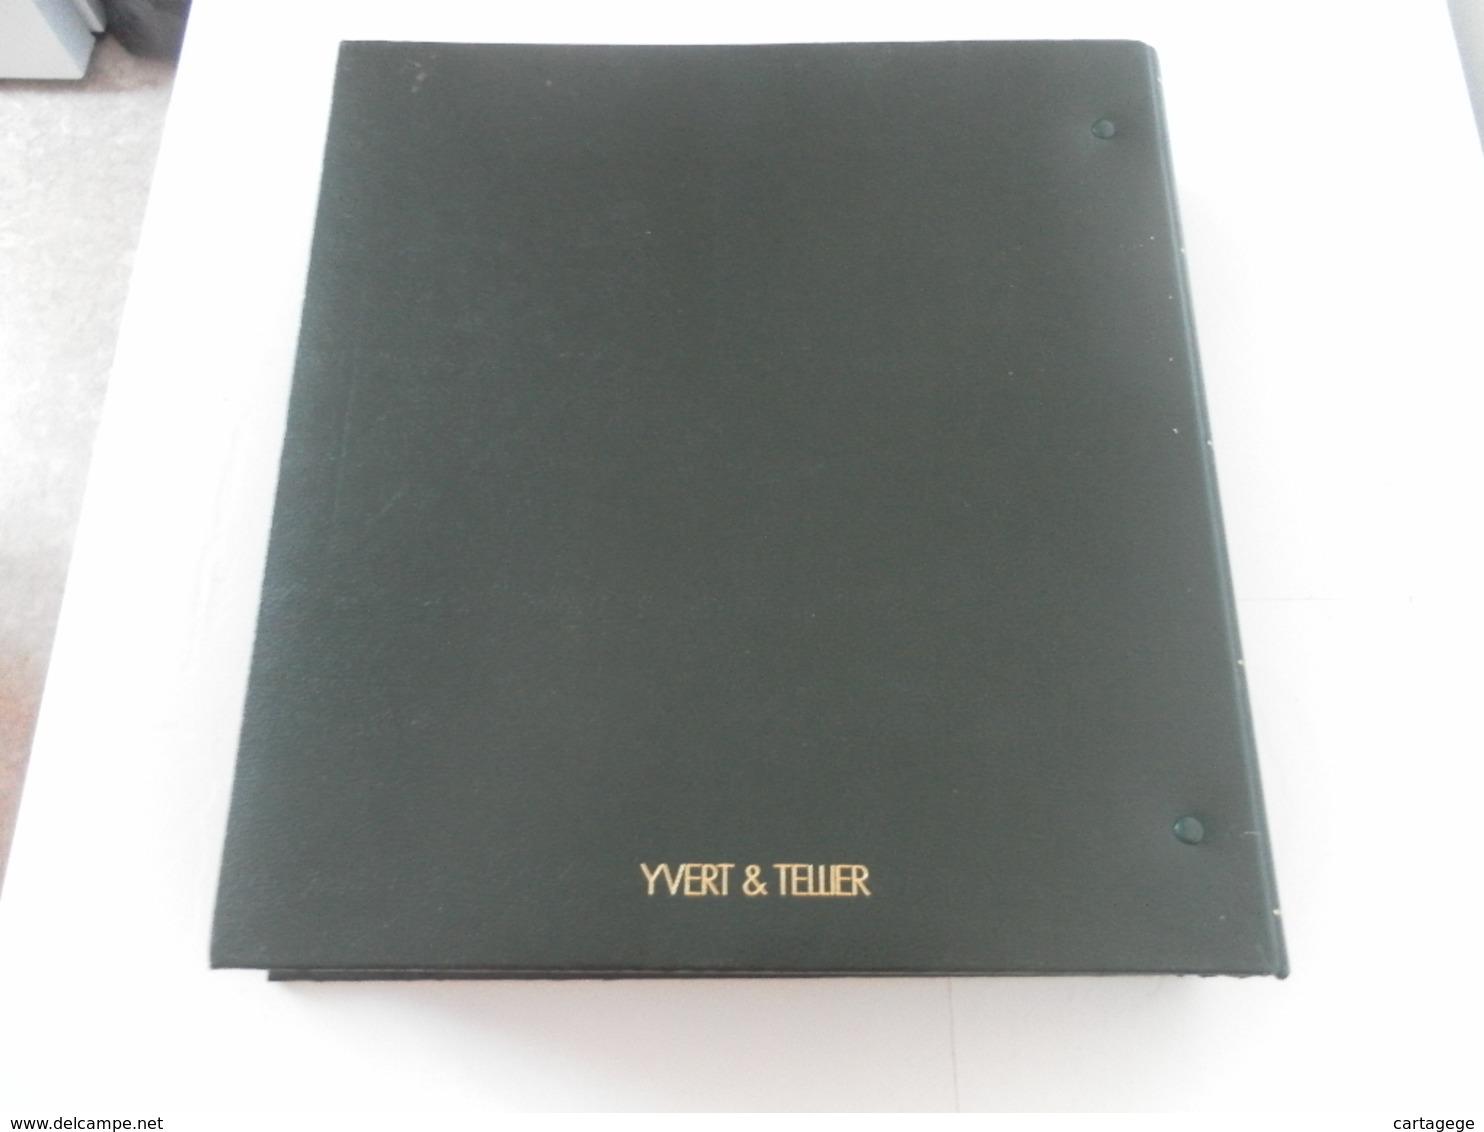 CLASSEUR YVERT ET TELLIER VERT A BANDE NOIRES 7 Bandes - Grand Format, Fond Noir